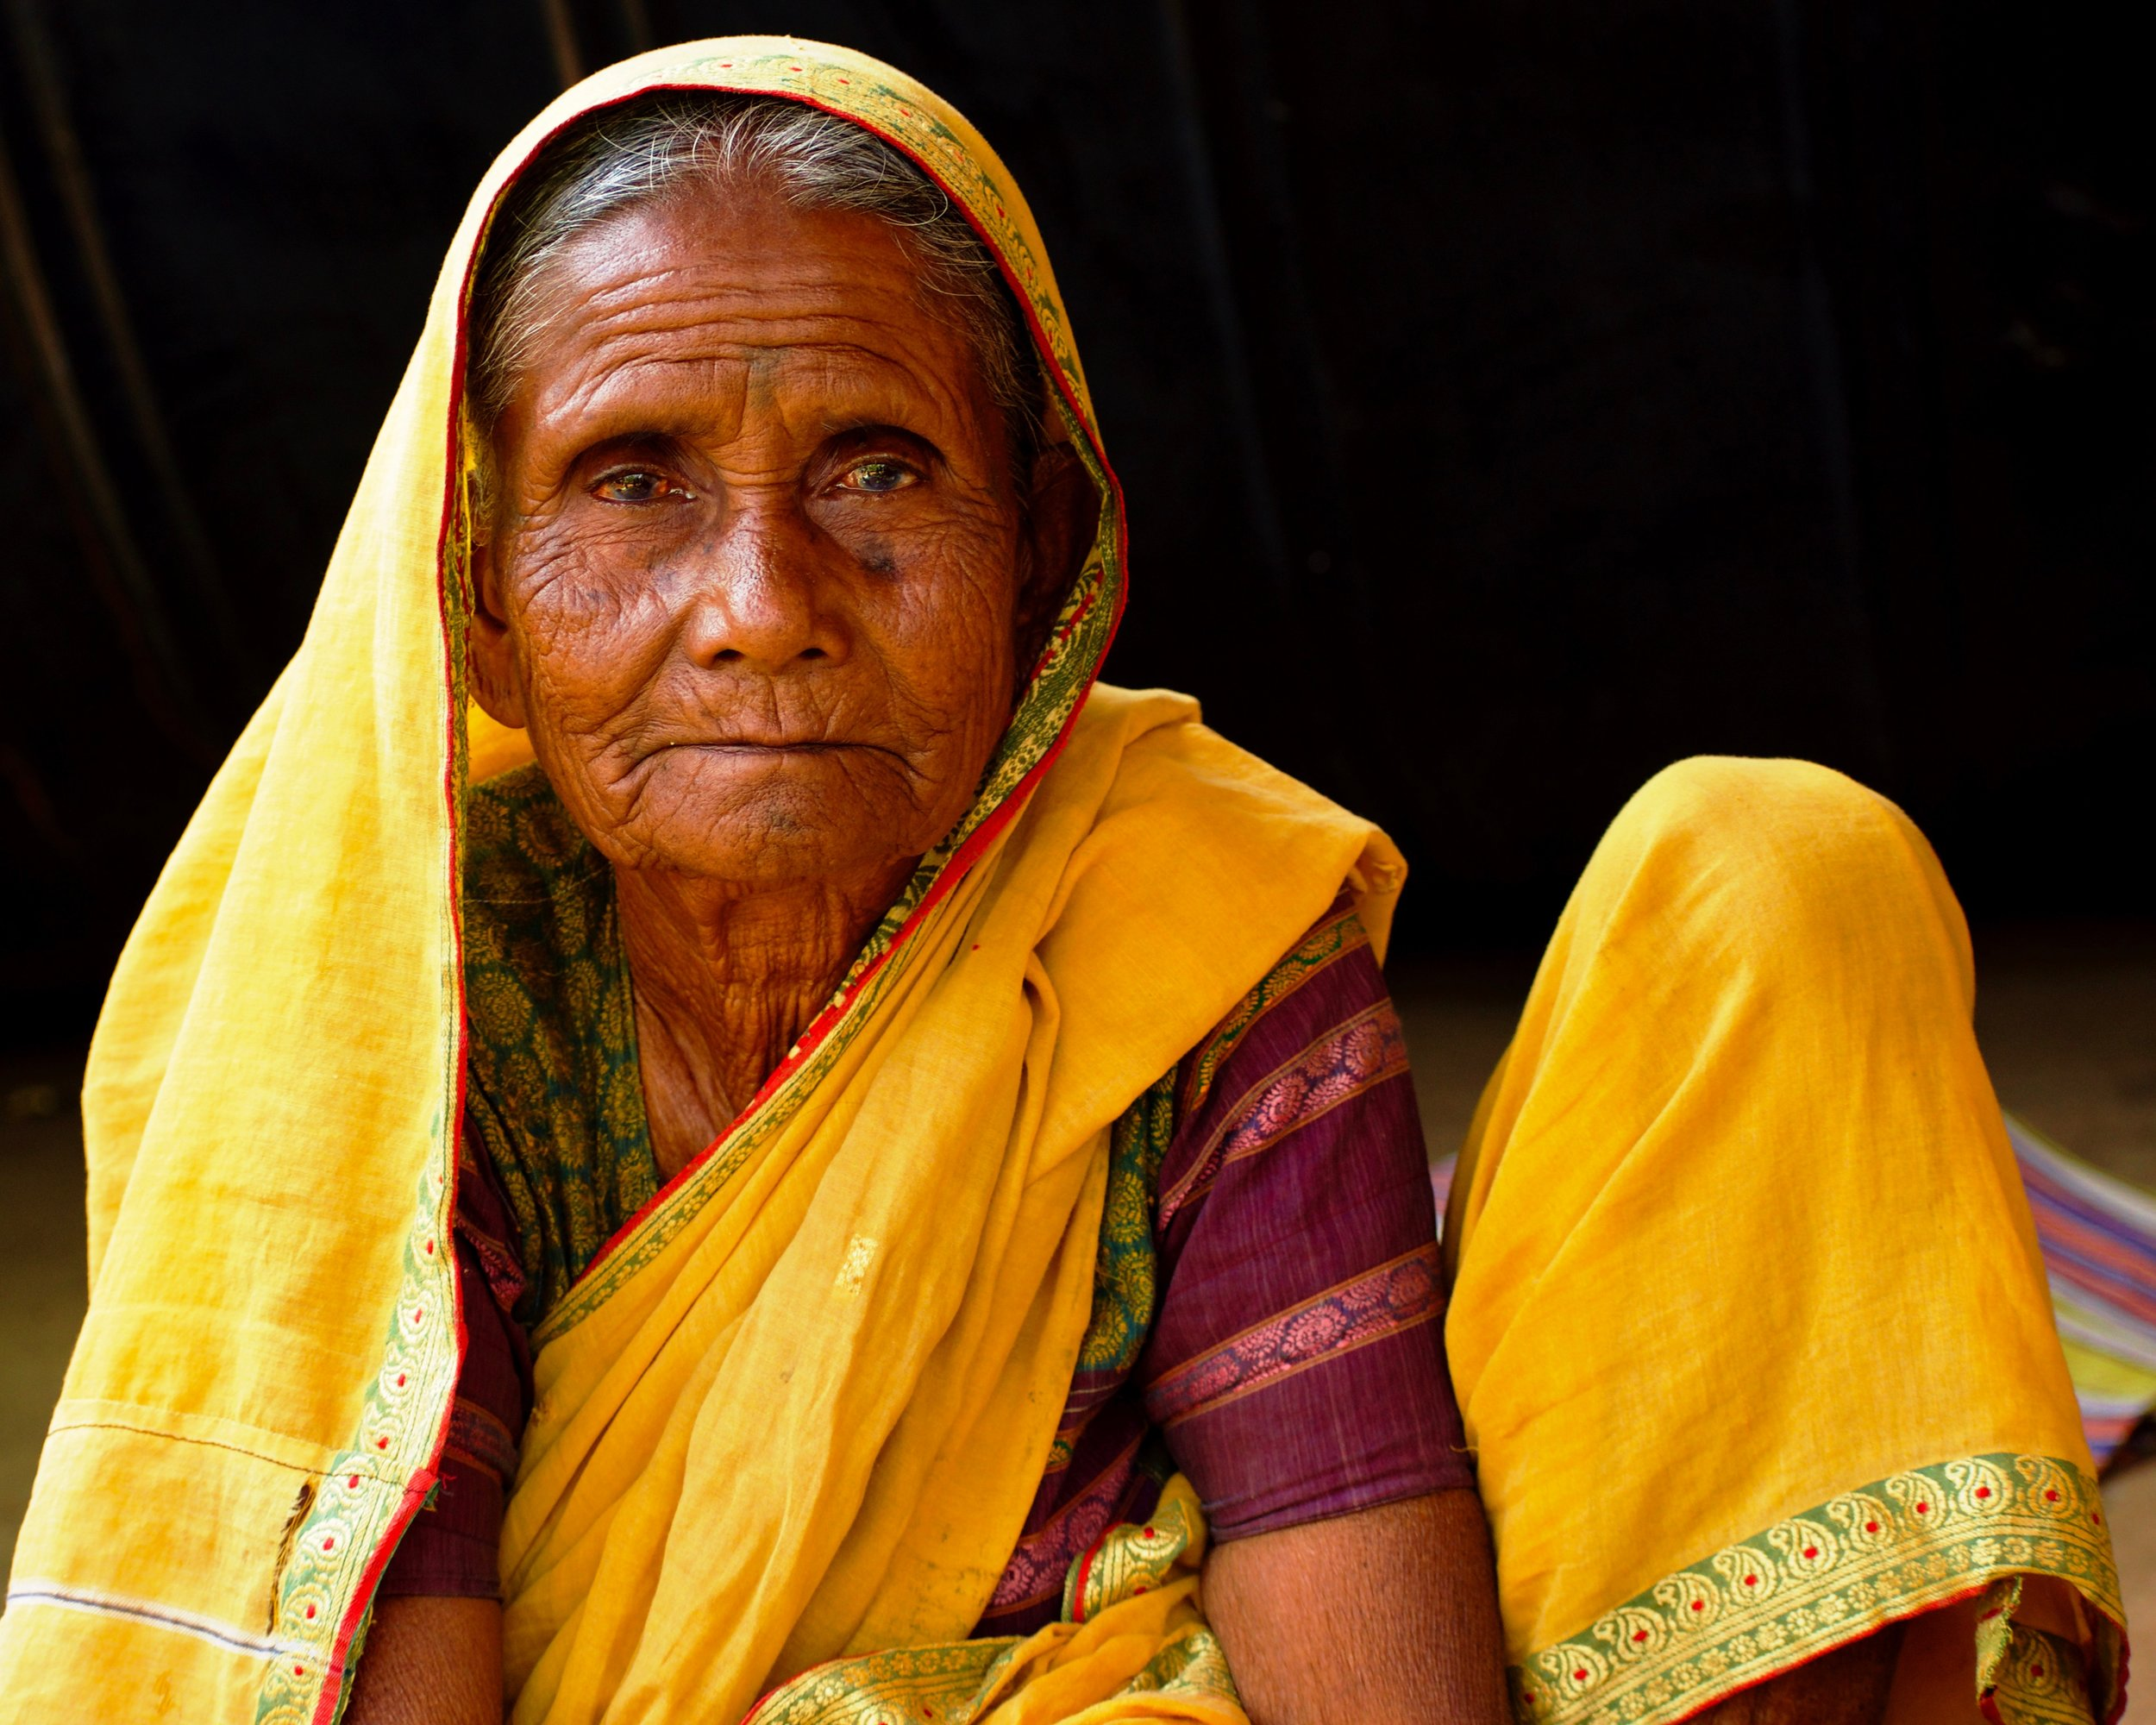 Indian Woman in a sari